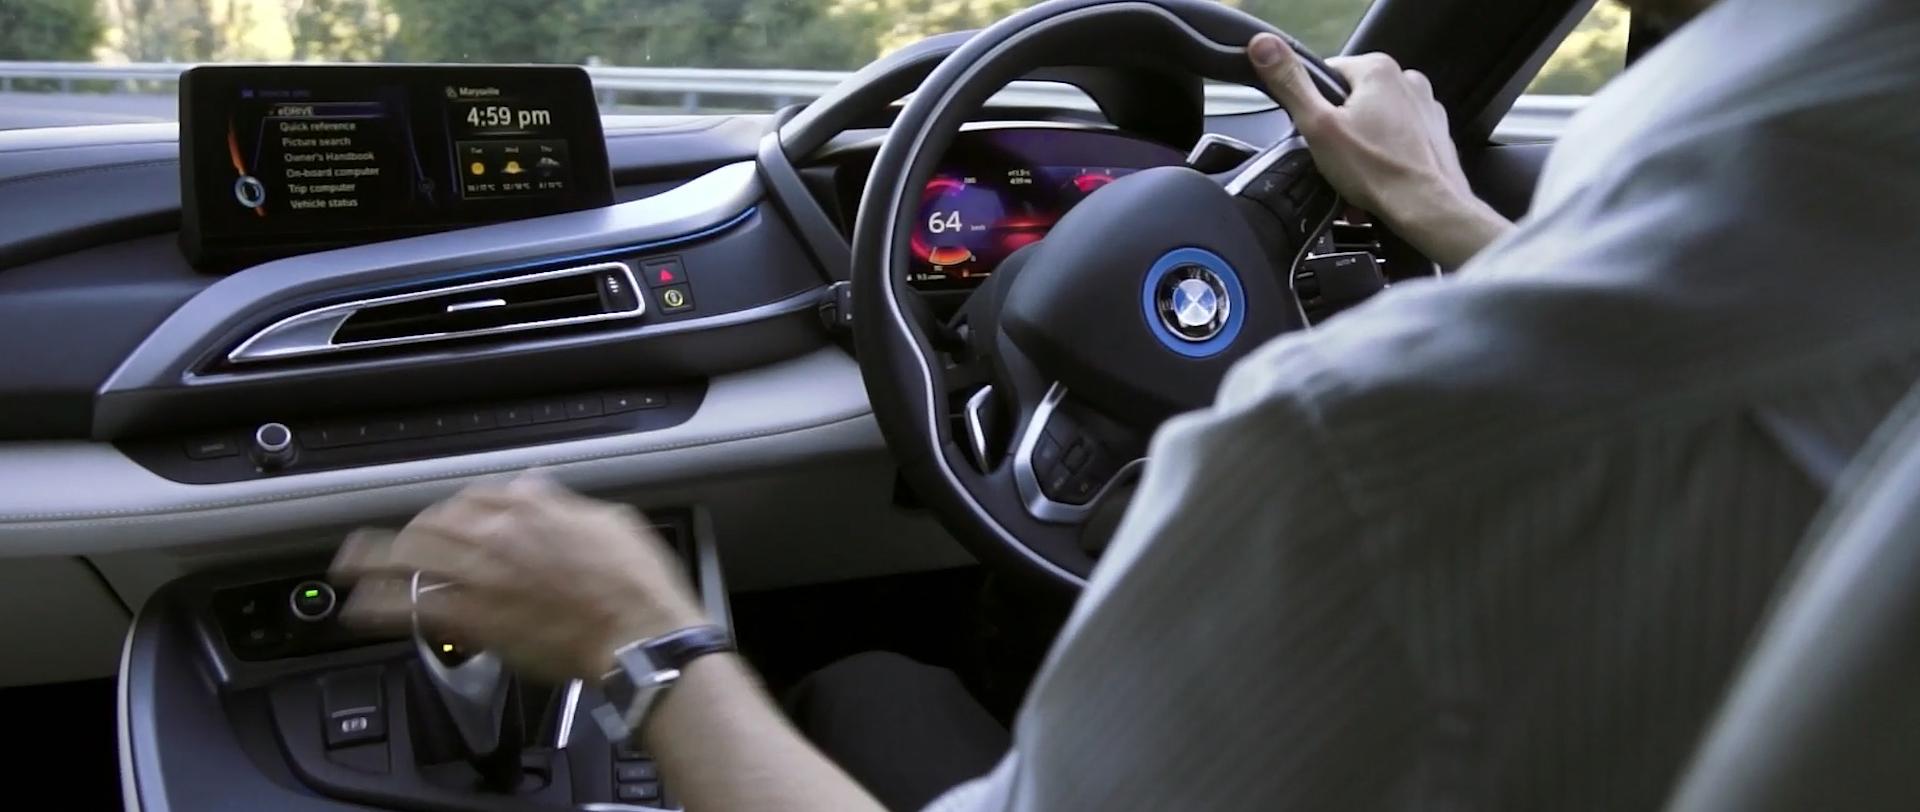 BMW i8 15.jpg